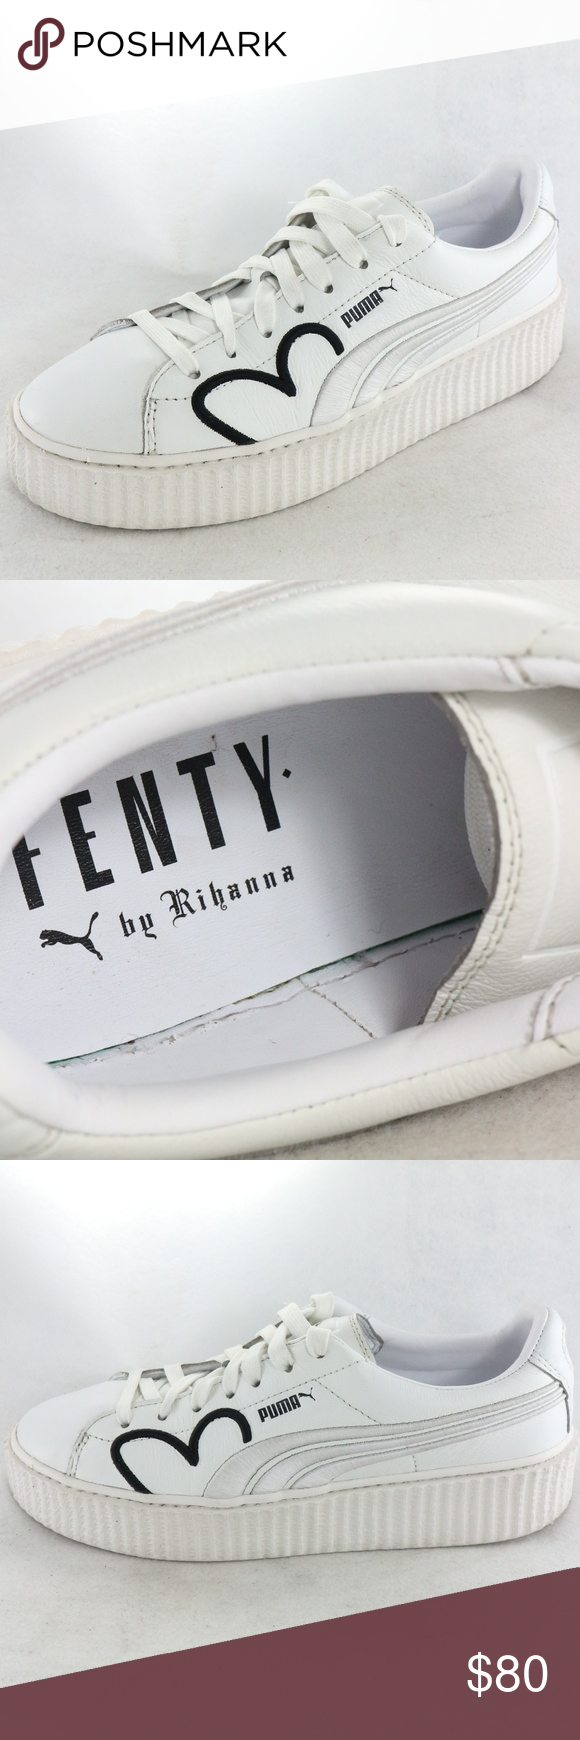 competitive price 4ab52 7dd2d RARE Puma x Fenty Clara Lionel Creeper White Shoes RARE Puma ...